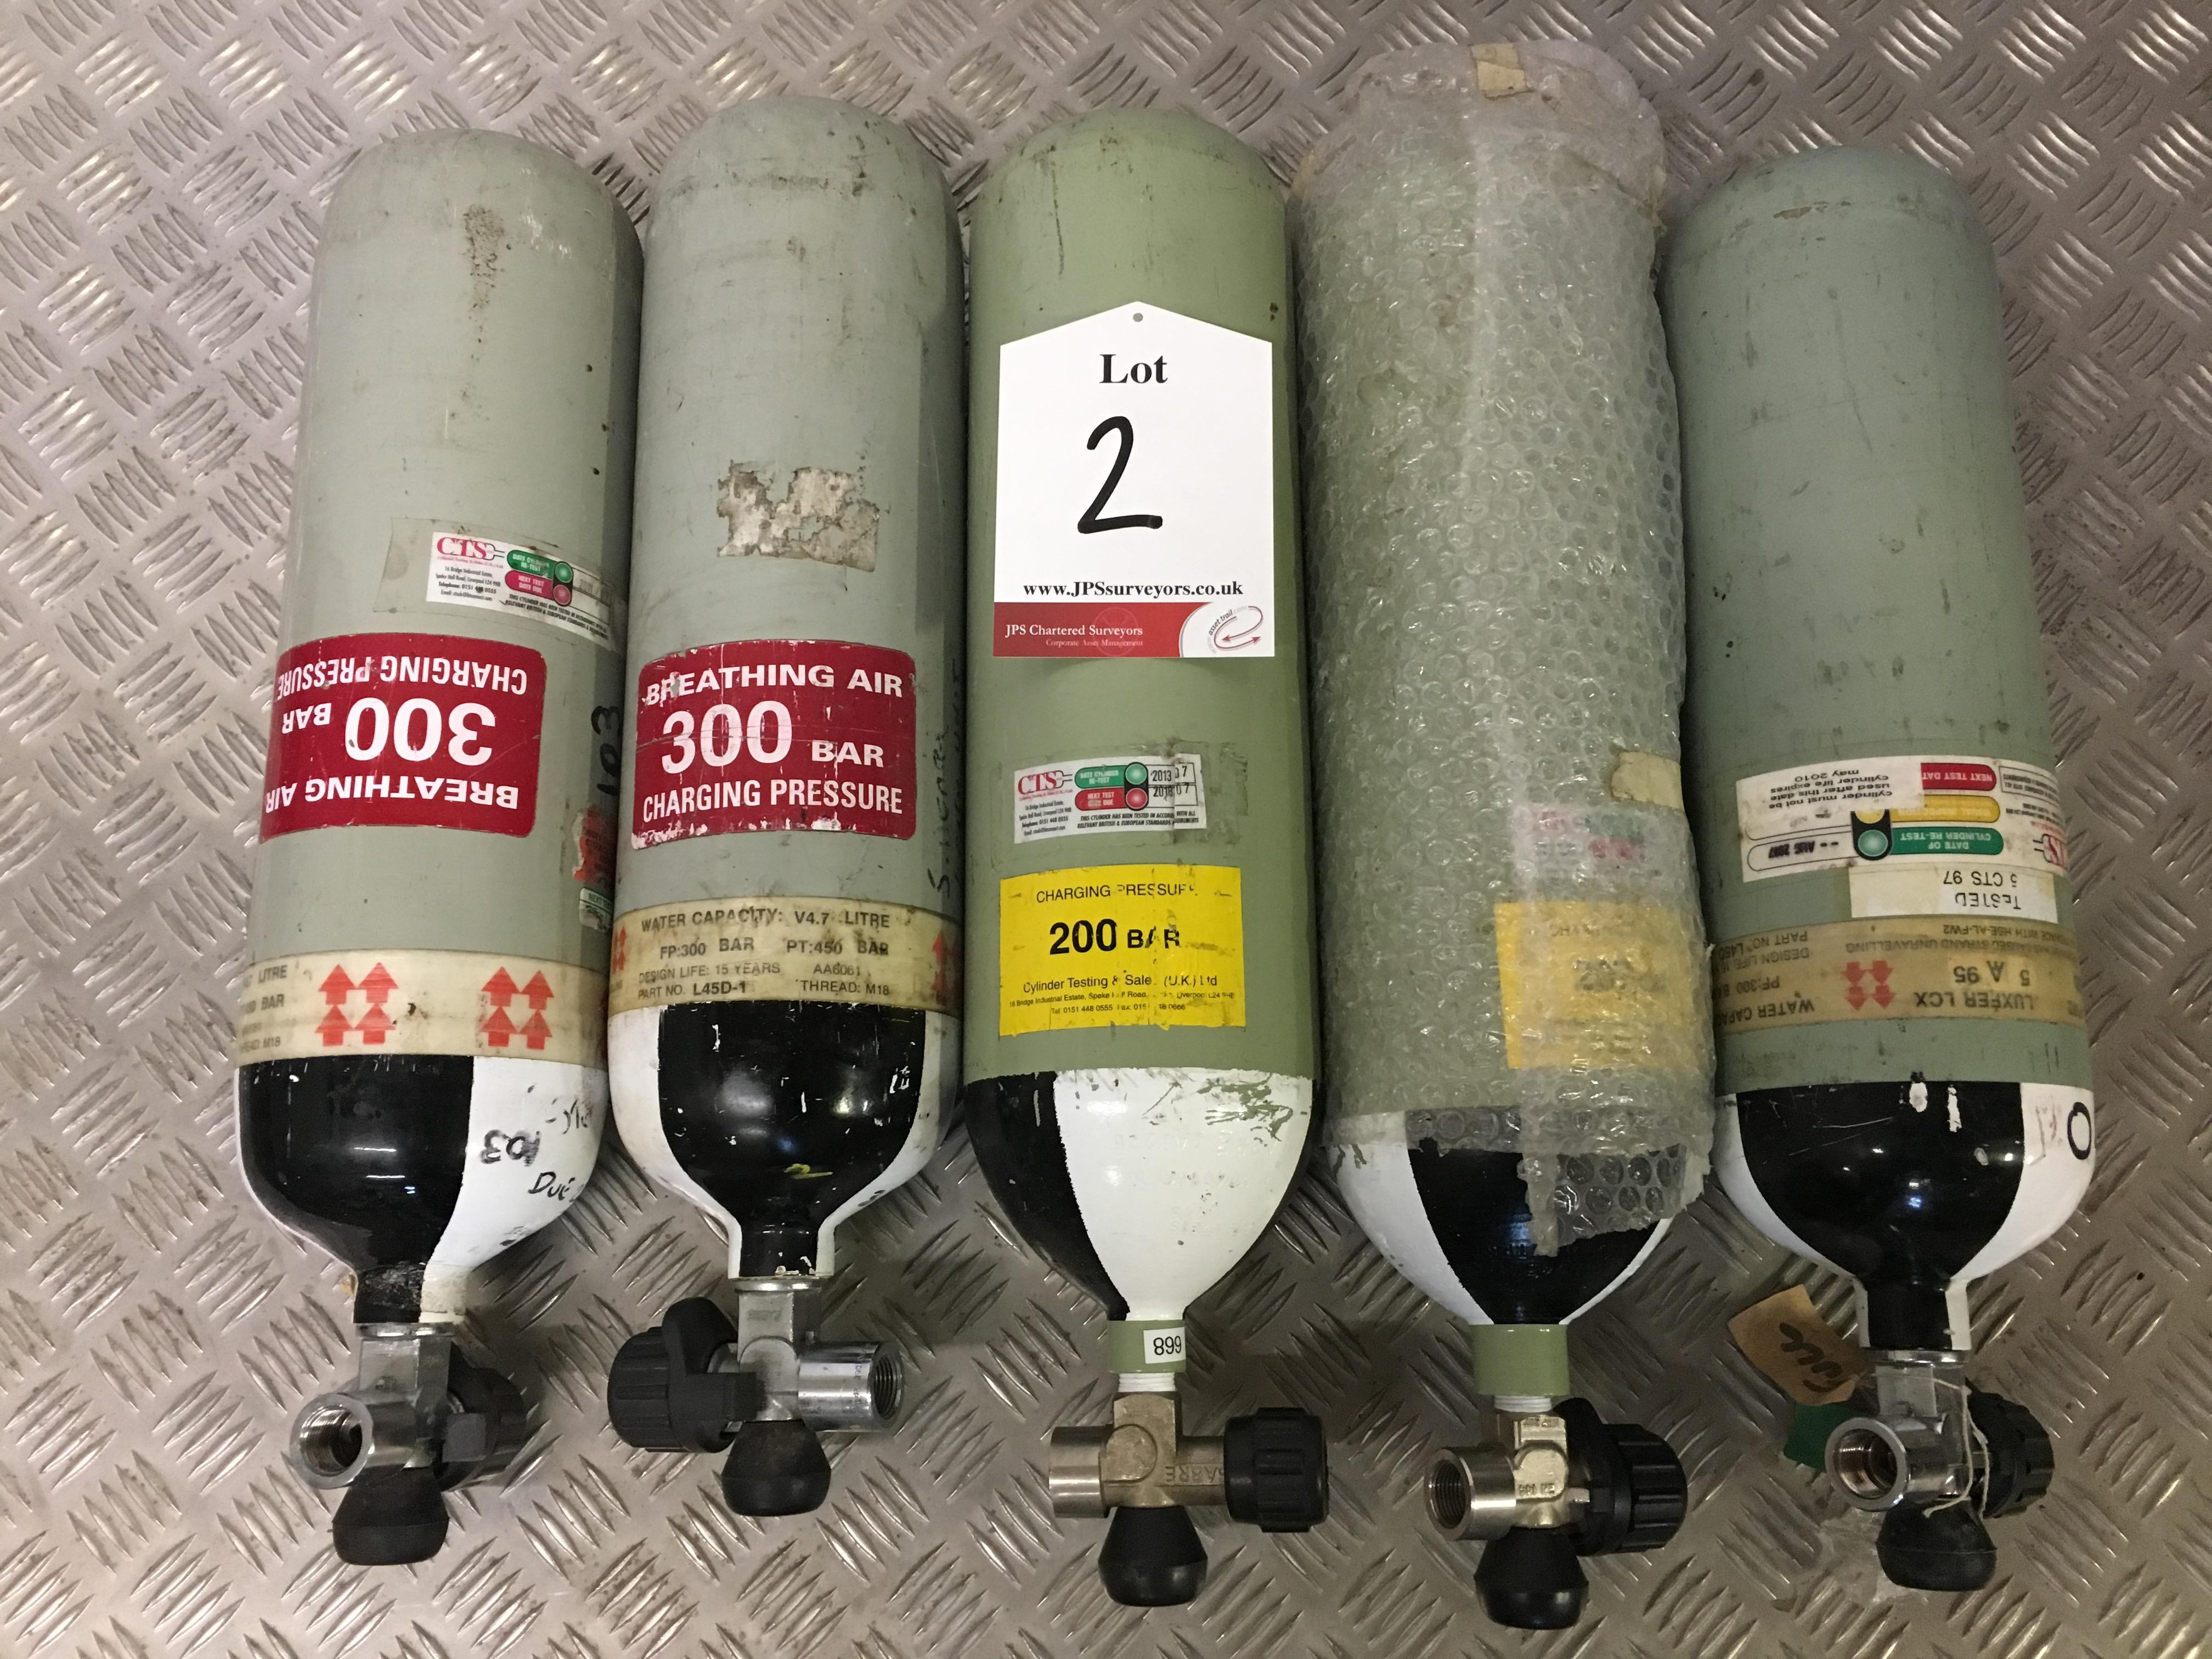 Lot 2 - 5 x Sabre 200 Bar Compressed Air Cylinder with Saver Valves